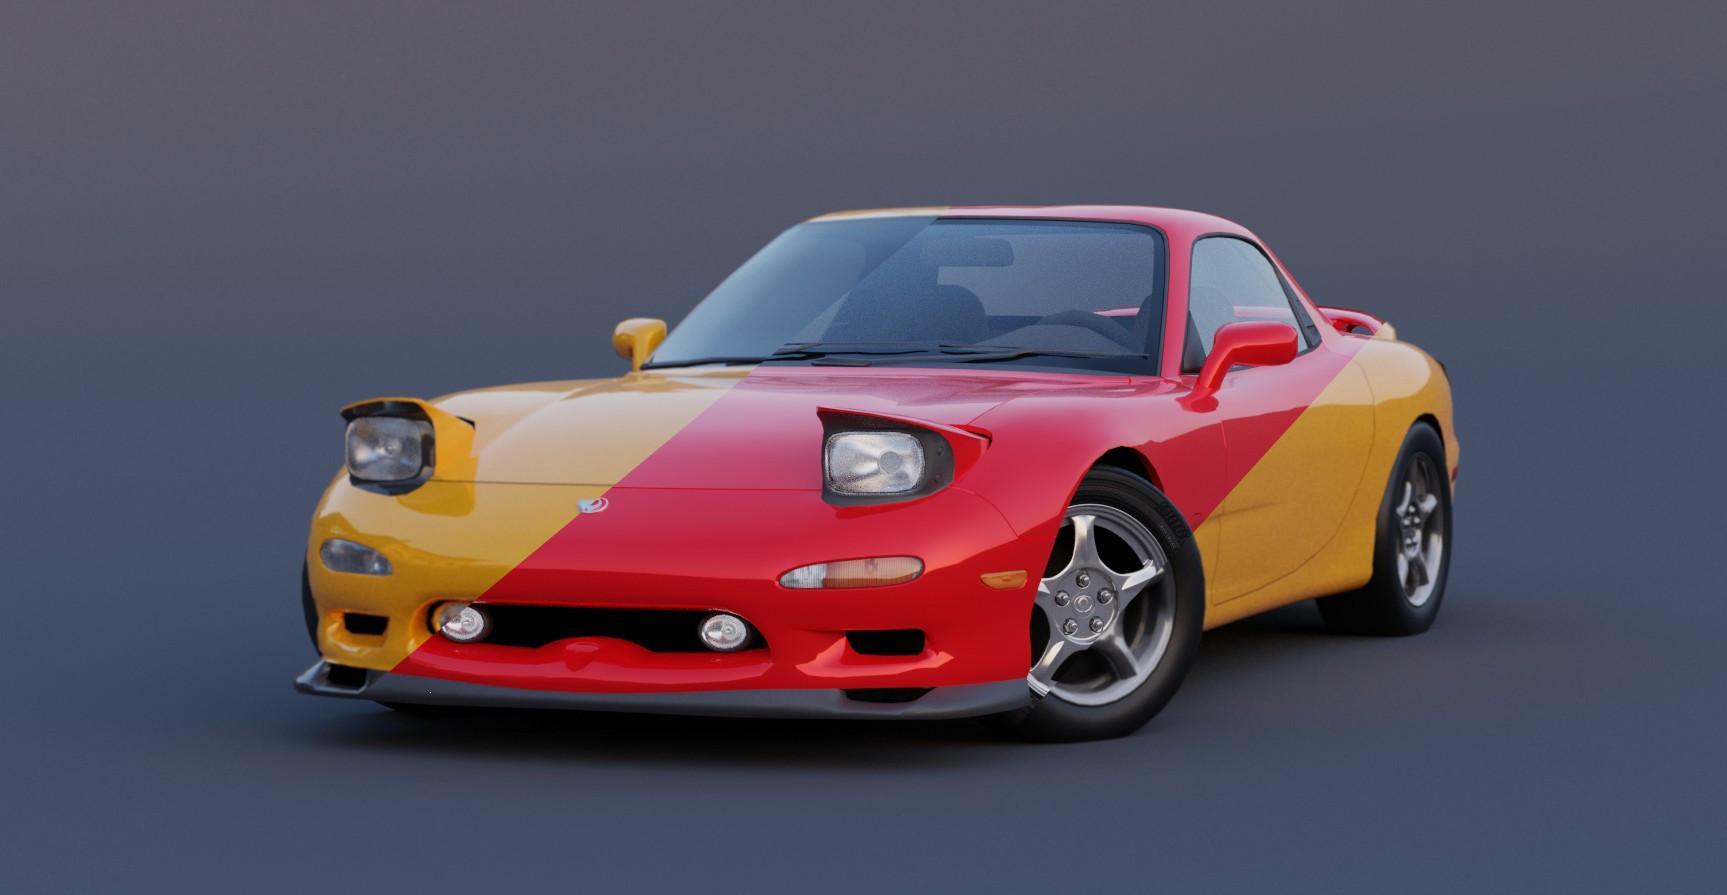 Kelebihan Kekurangan Mazda Rx7 Fd3S Murah Berkualitas